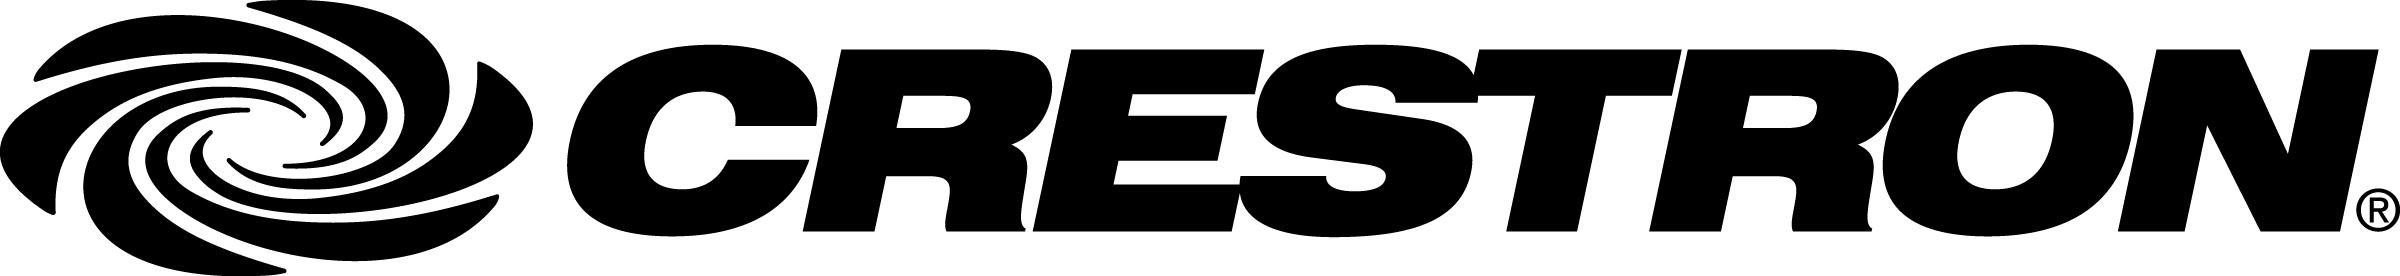 crestron_logo_black.jpg